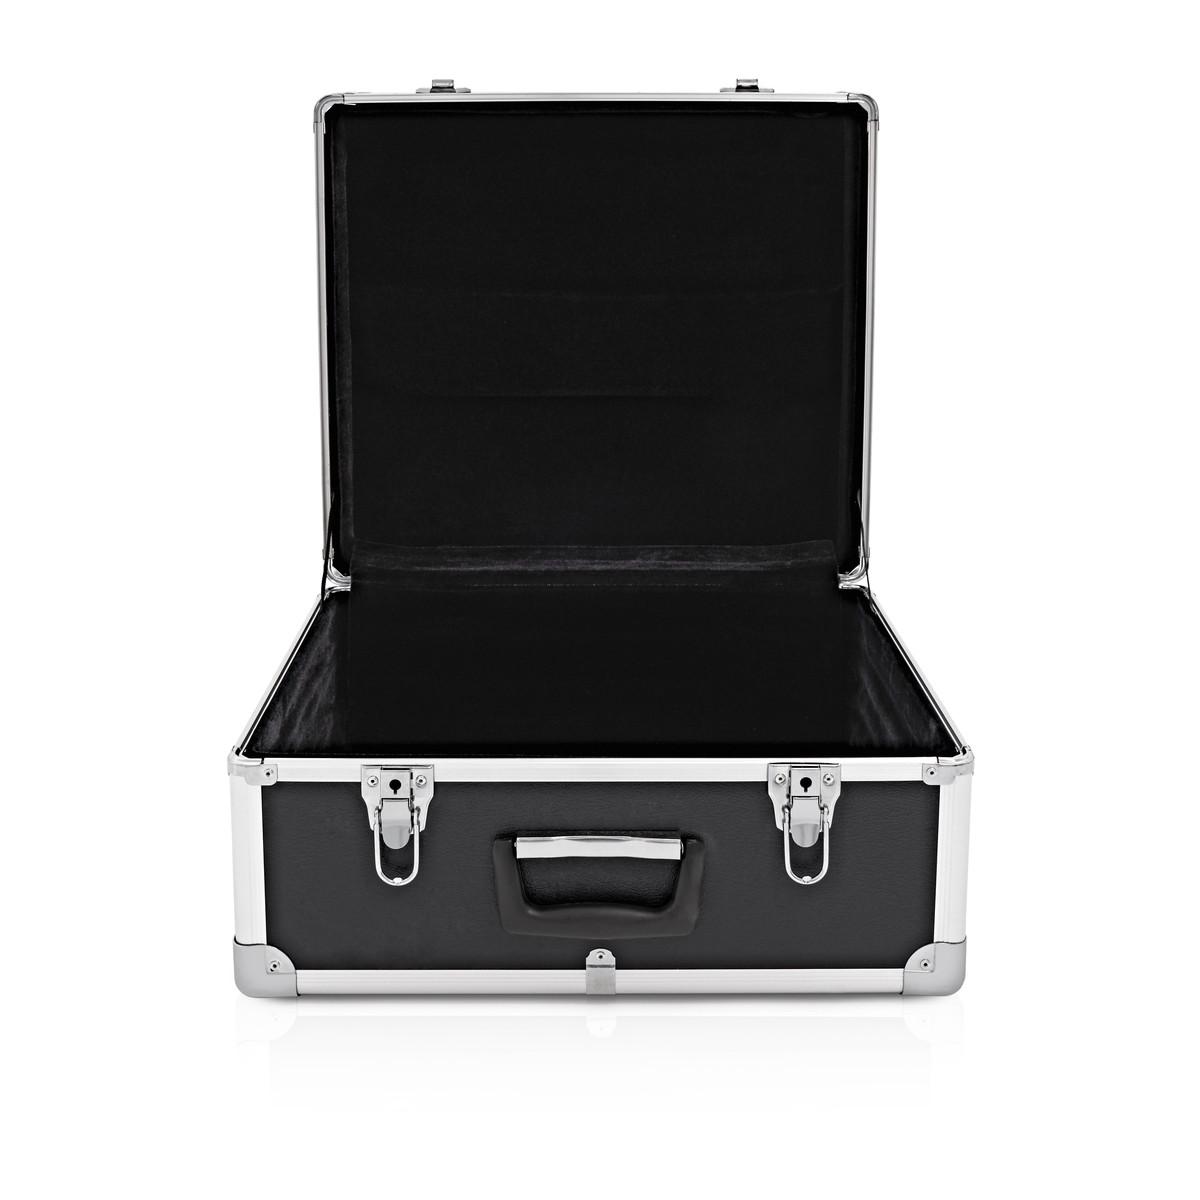 27 sleutel/48 bas accordeon ABS geval door de Gear4music ... - photo#44